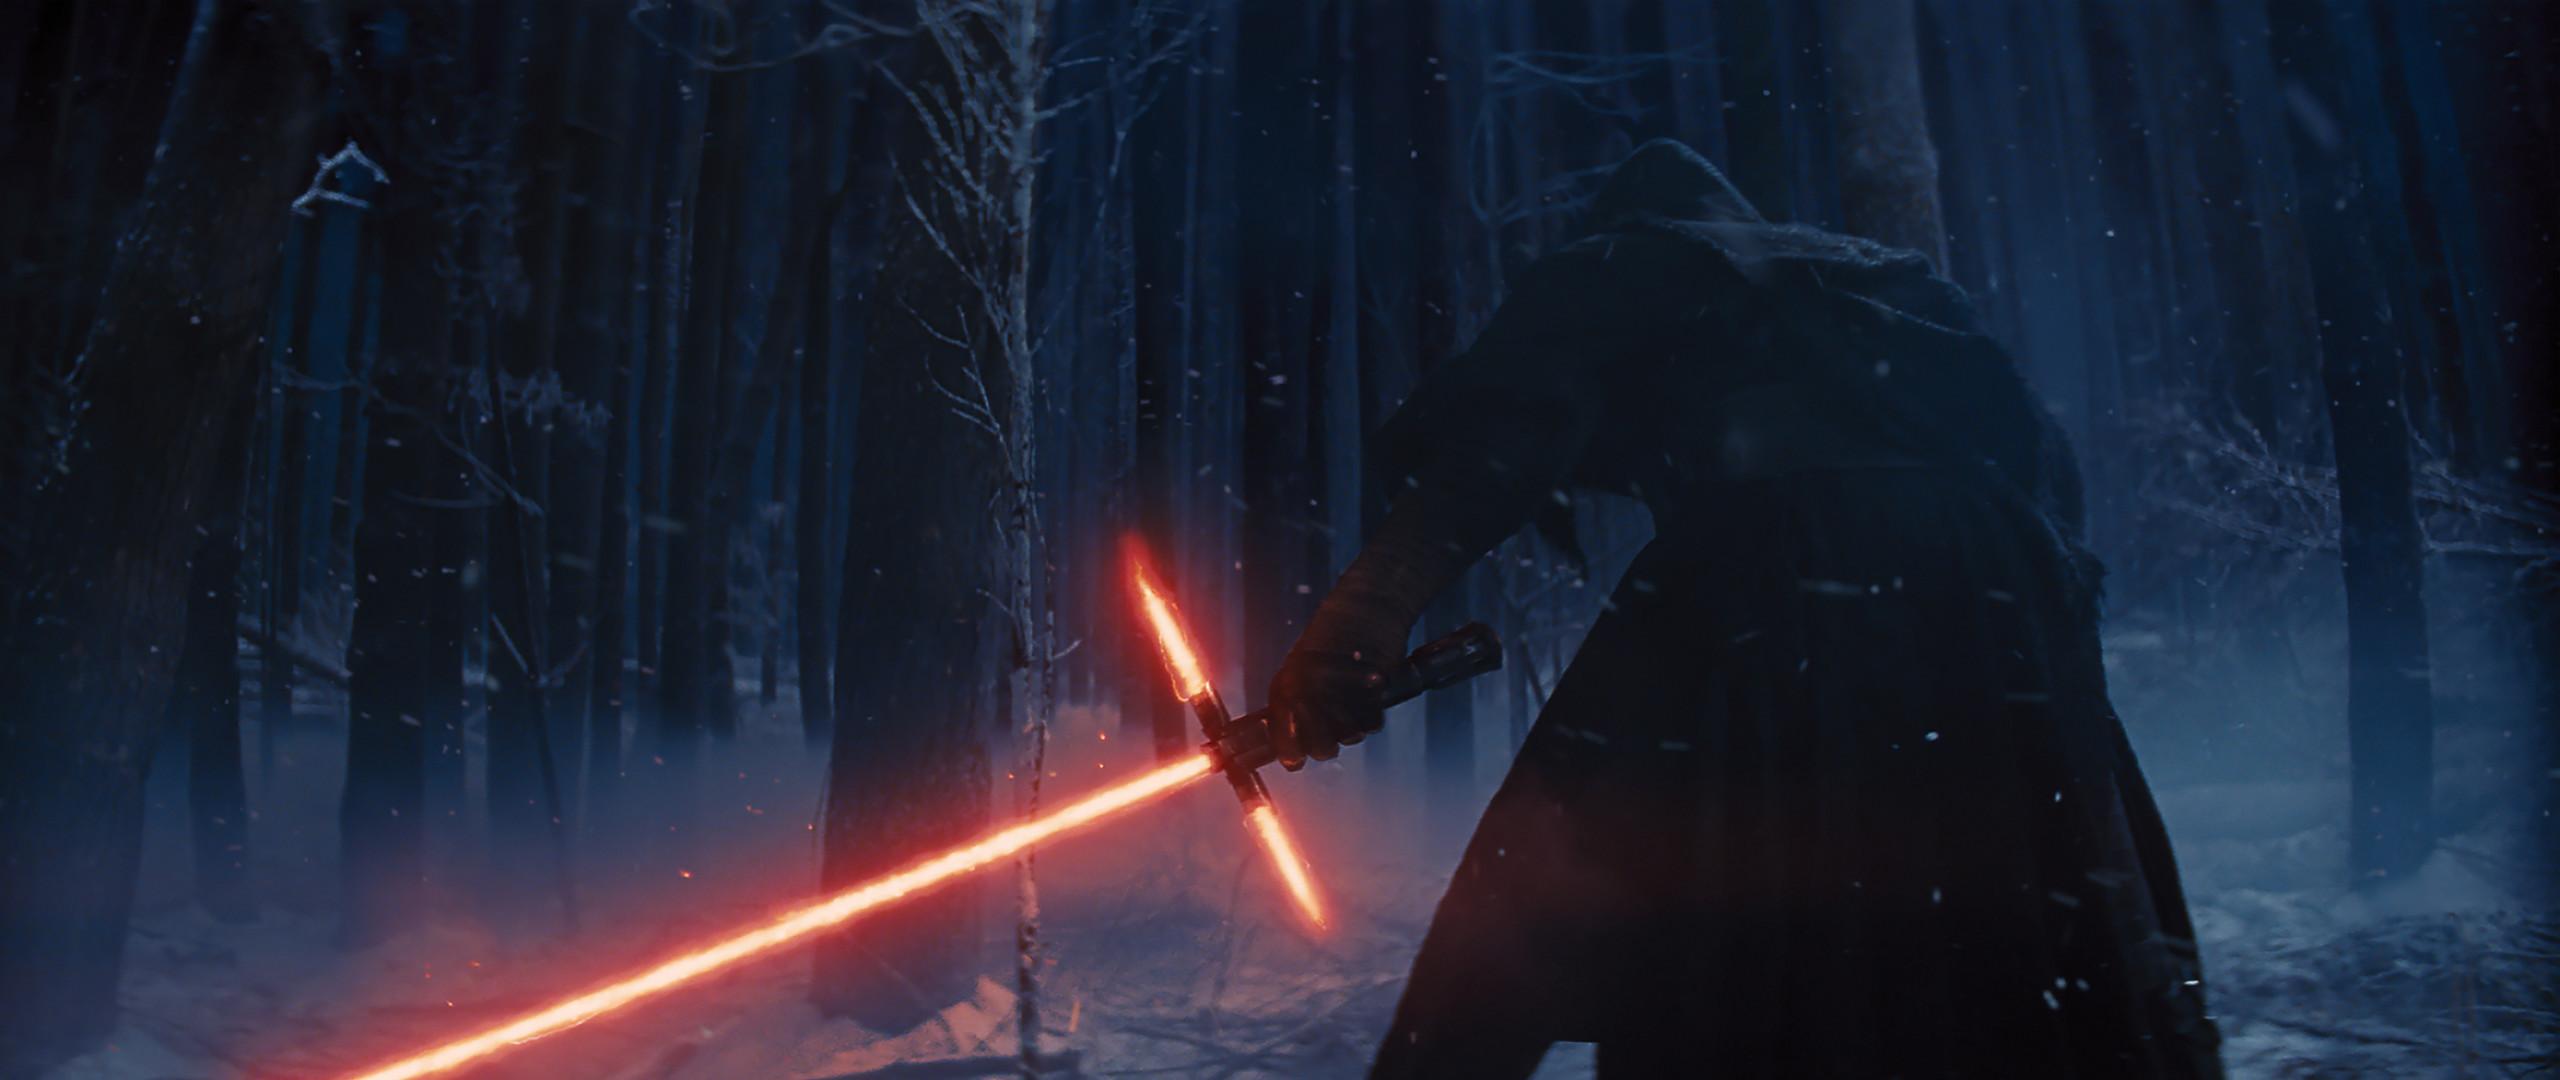 Star Wars: Episode VII The Force Awakens, Kylo Ren